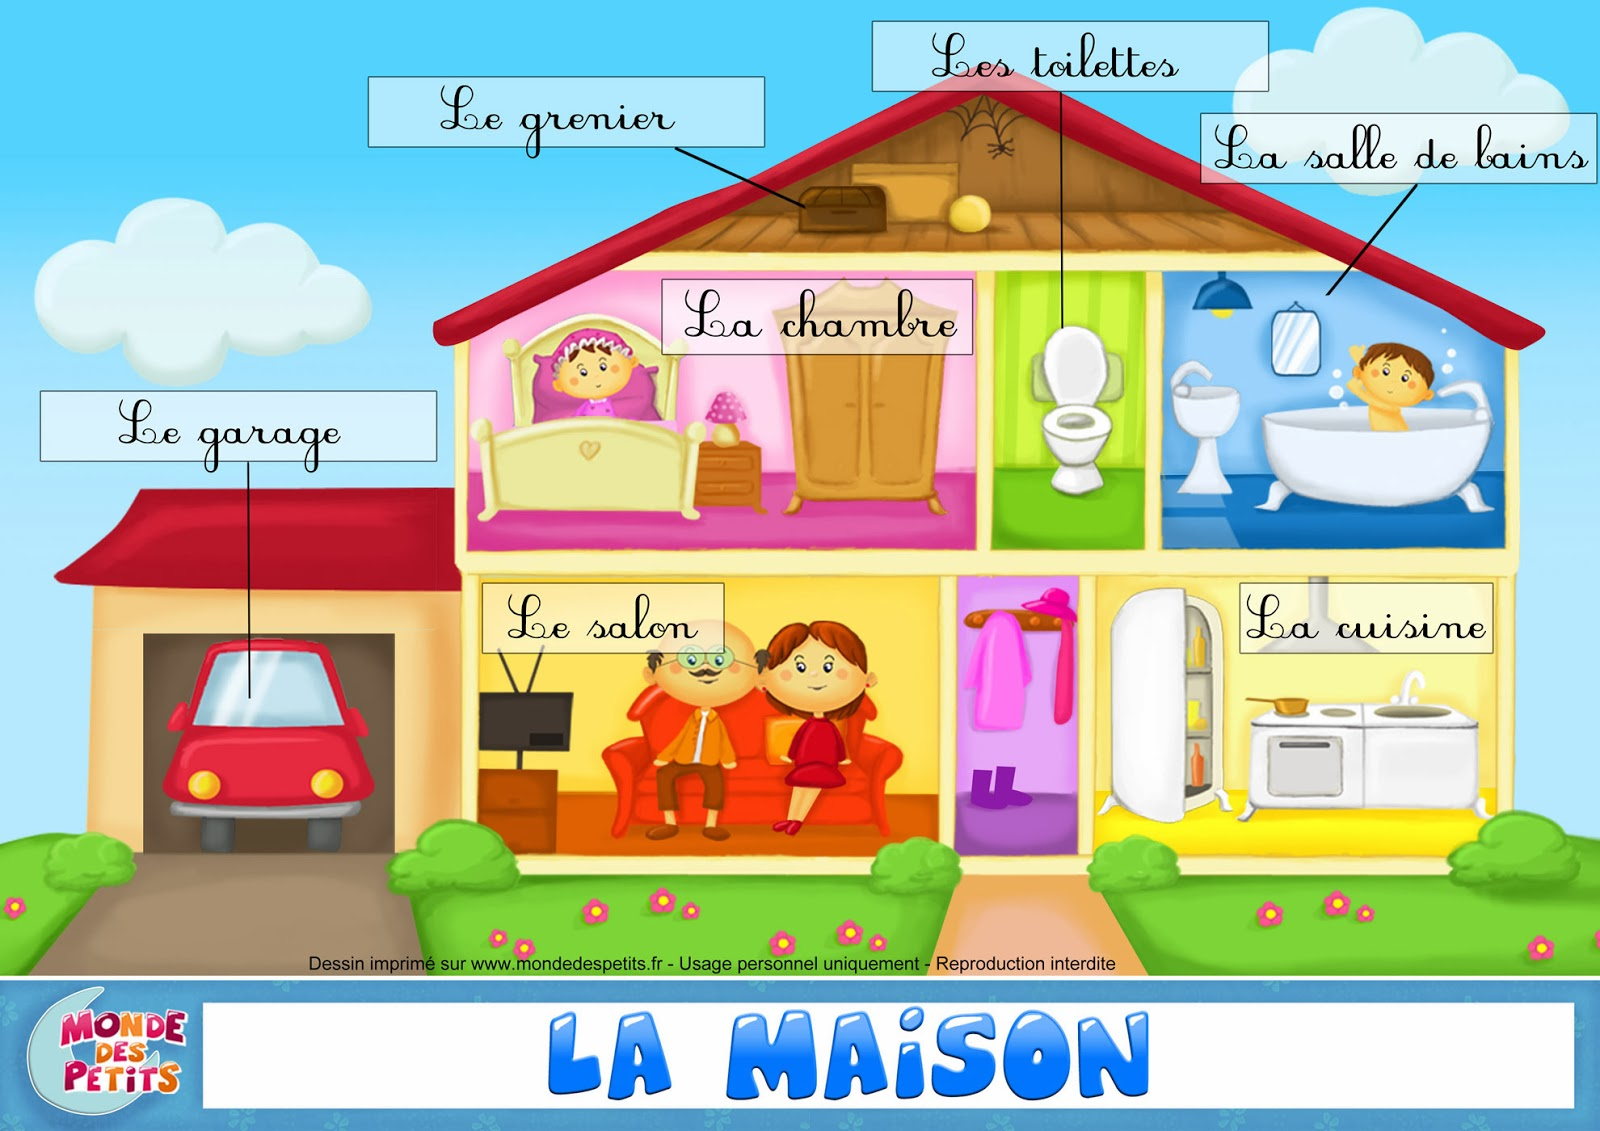 Sgblogosfera mar a jos arg eso la maison for A la maison translation